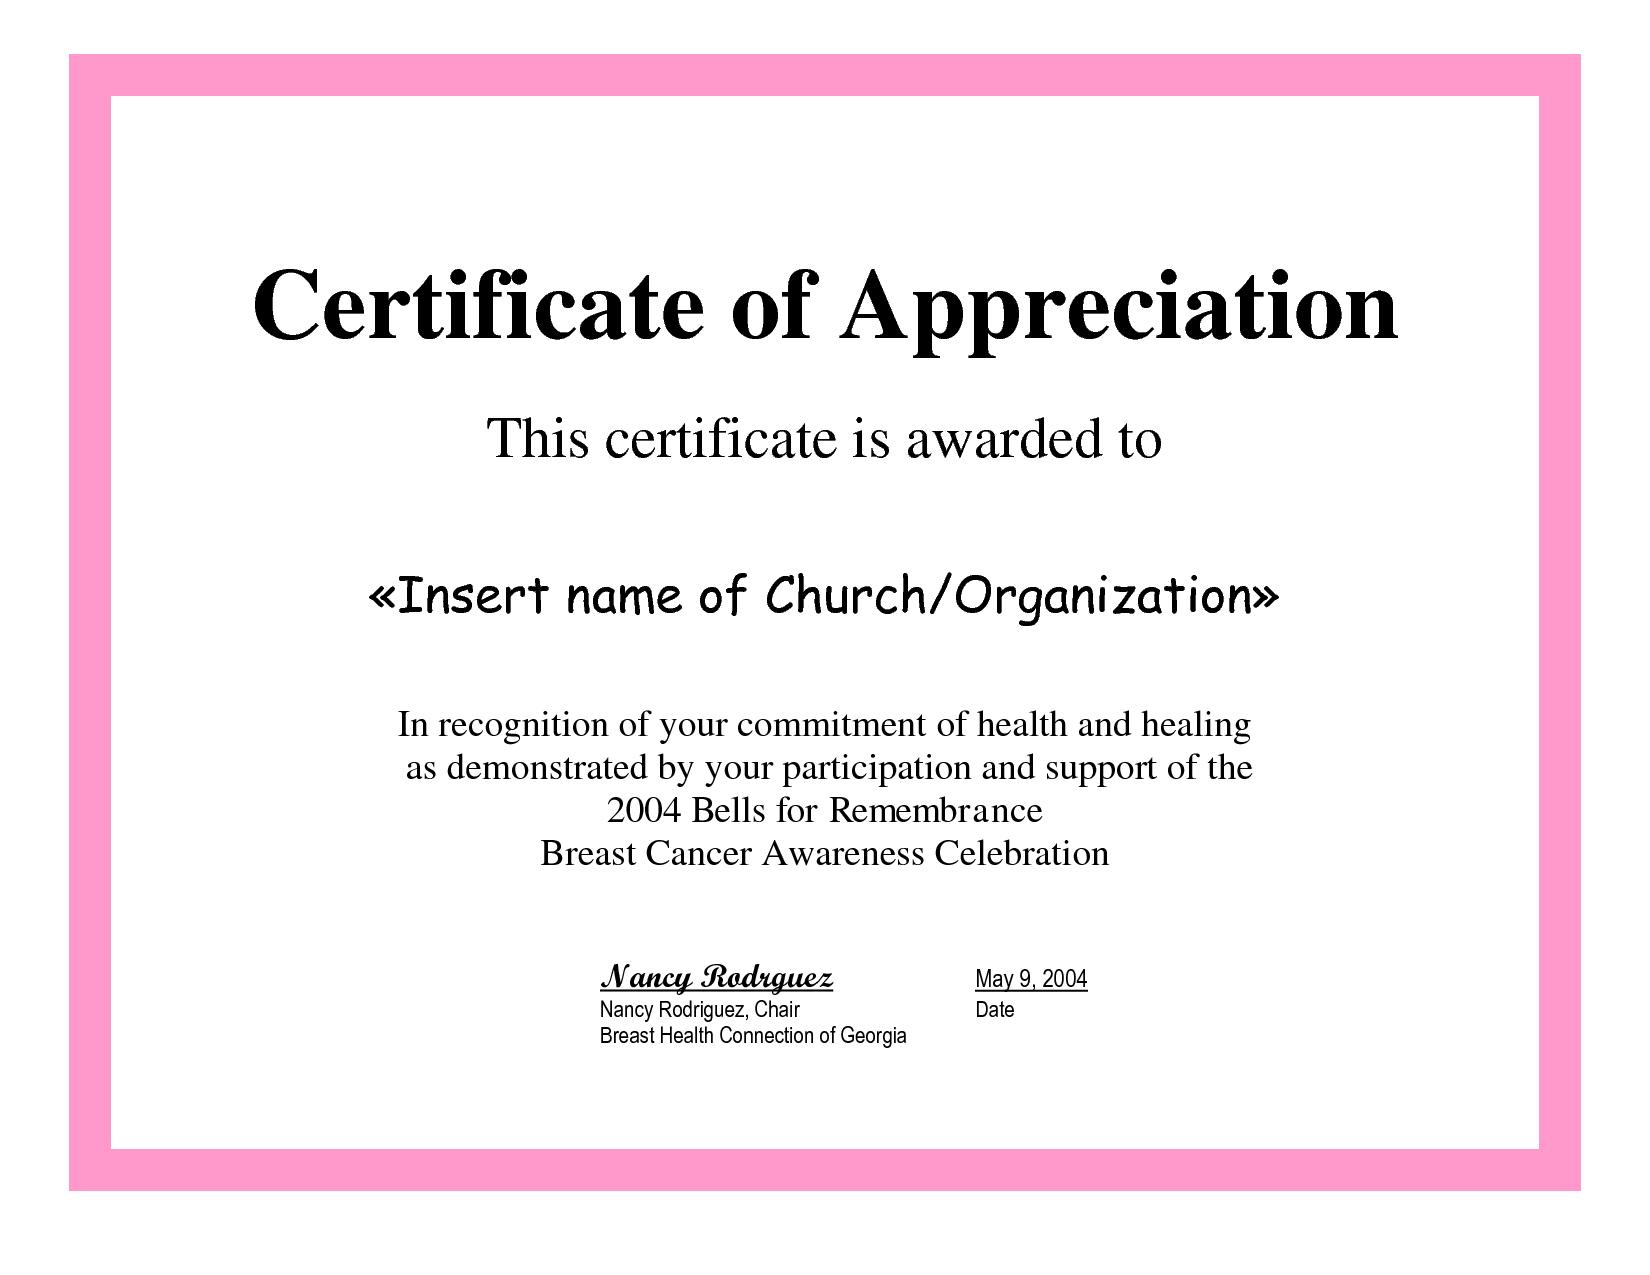 Certification of appreciation wording agreement template free pin by lisa clarke on teachers apprec pinterest teacher b48c586644bc52427cf7ebf0e6e2b30a 340514421811966616 certification of appreciation wording xflitez Image collections